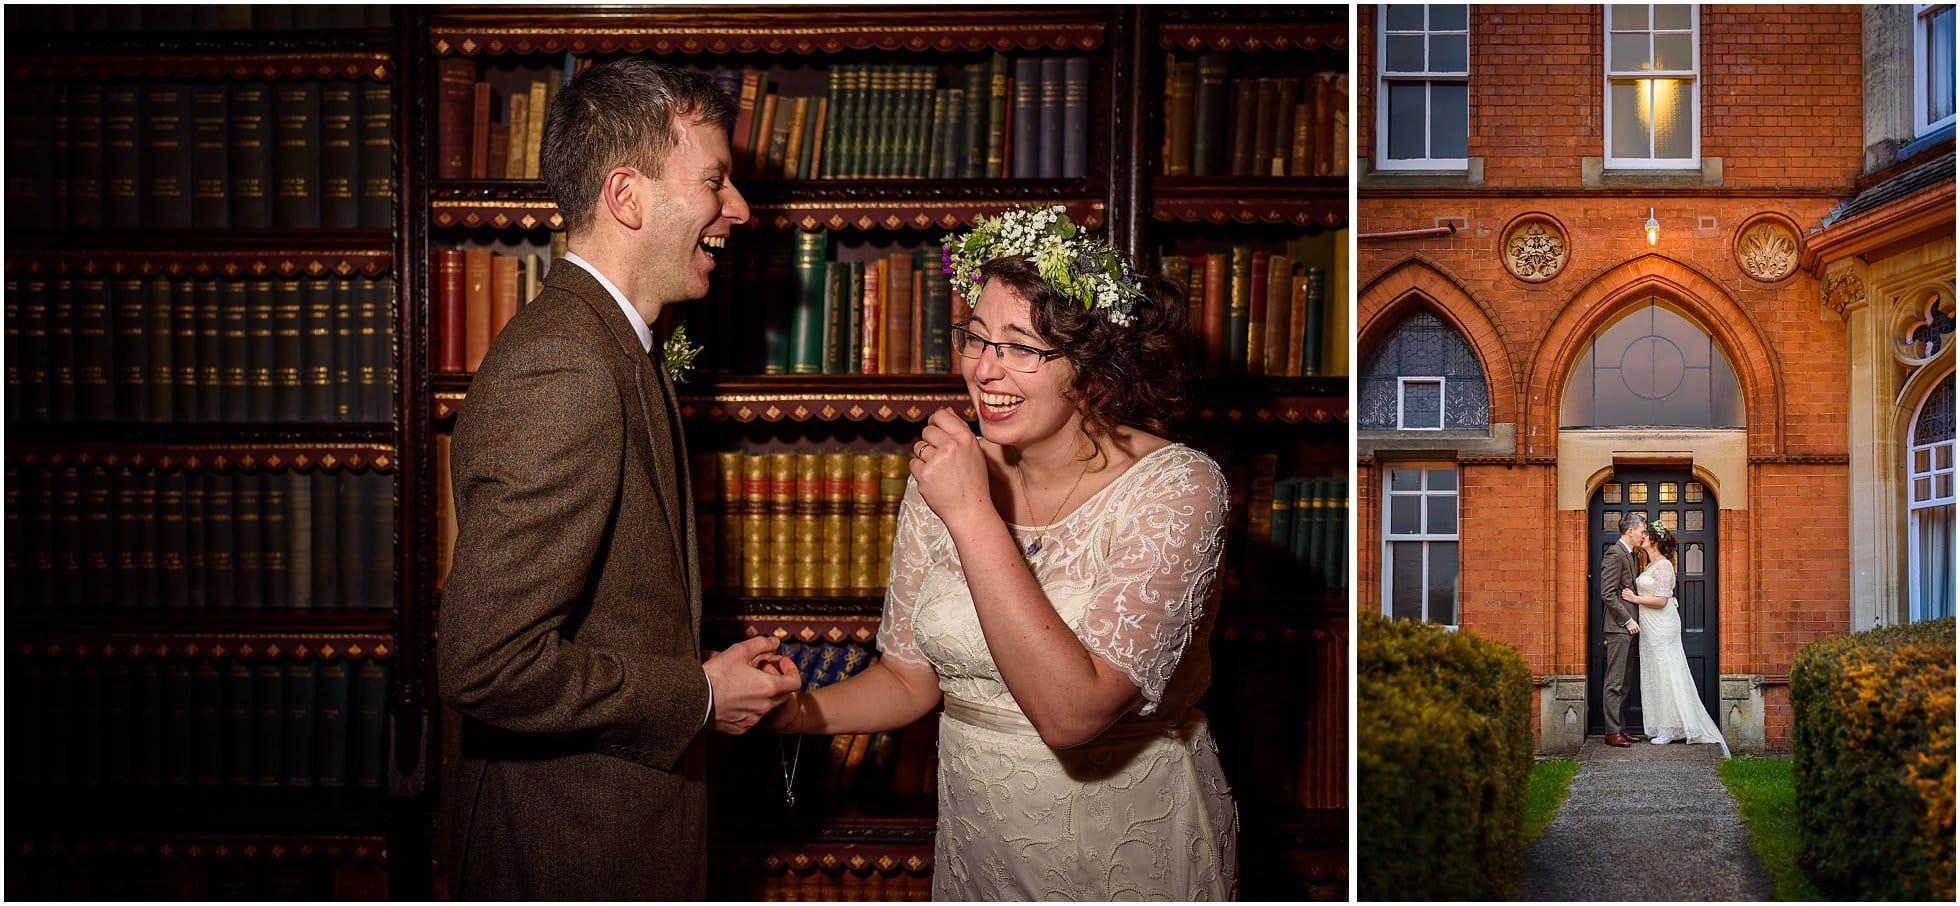 Highbury Hall Wedding Photographer shooting Bride and groom fun portraits